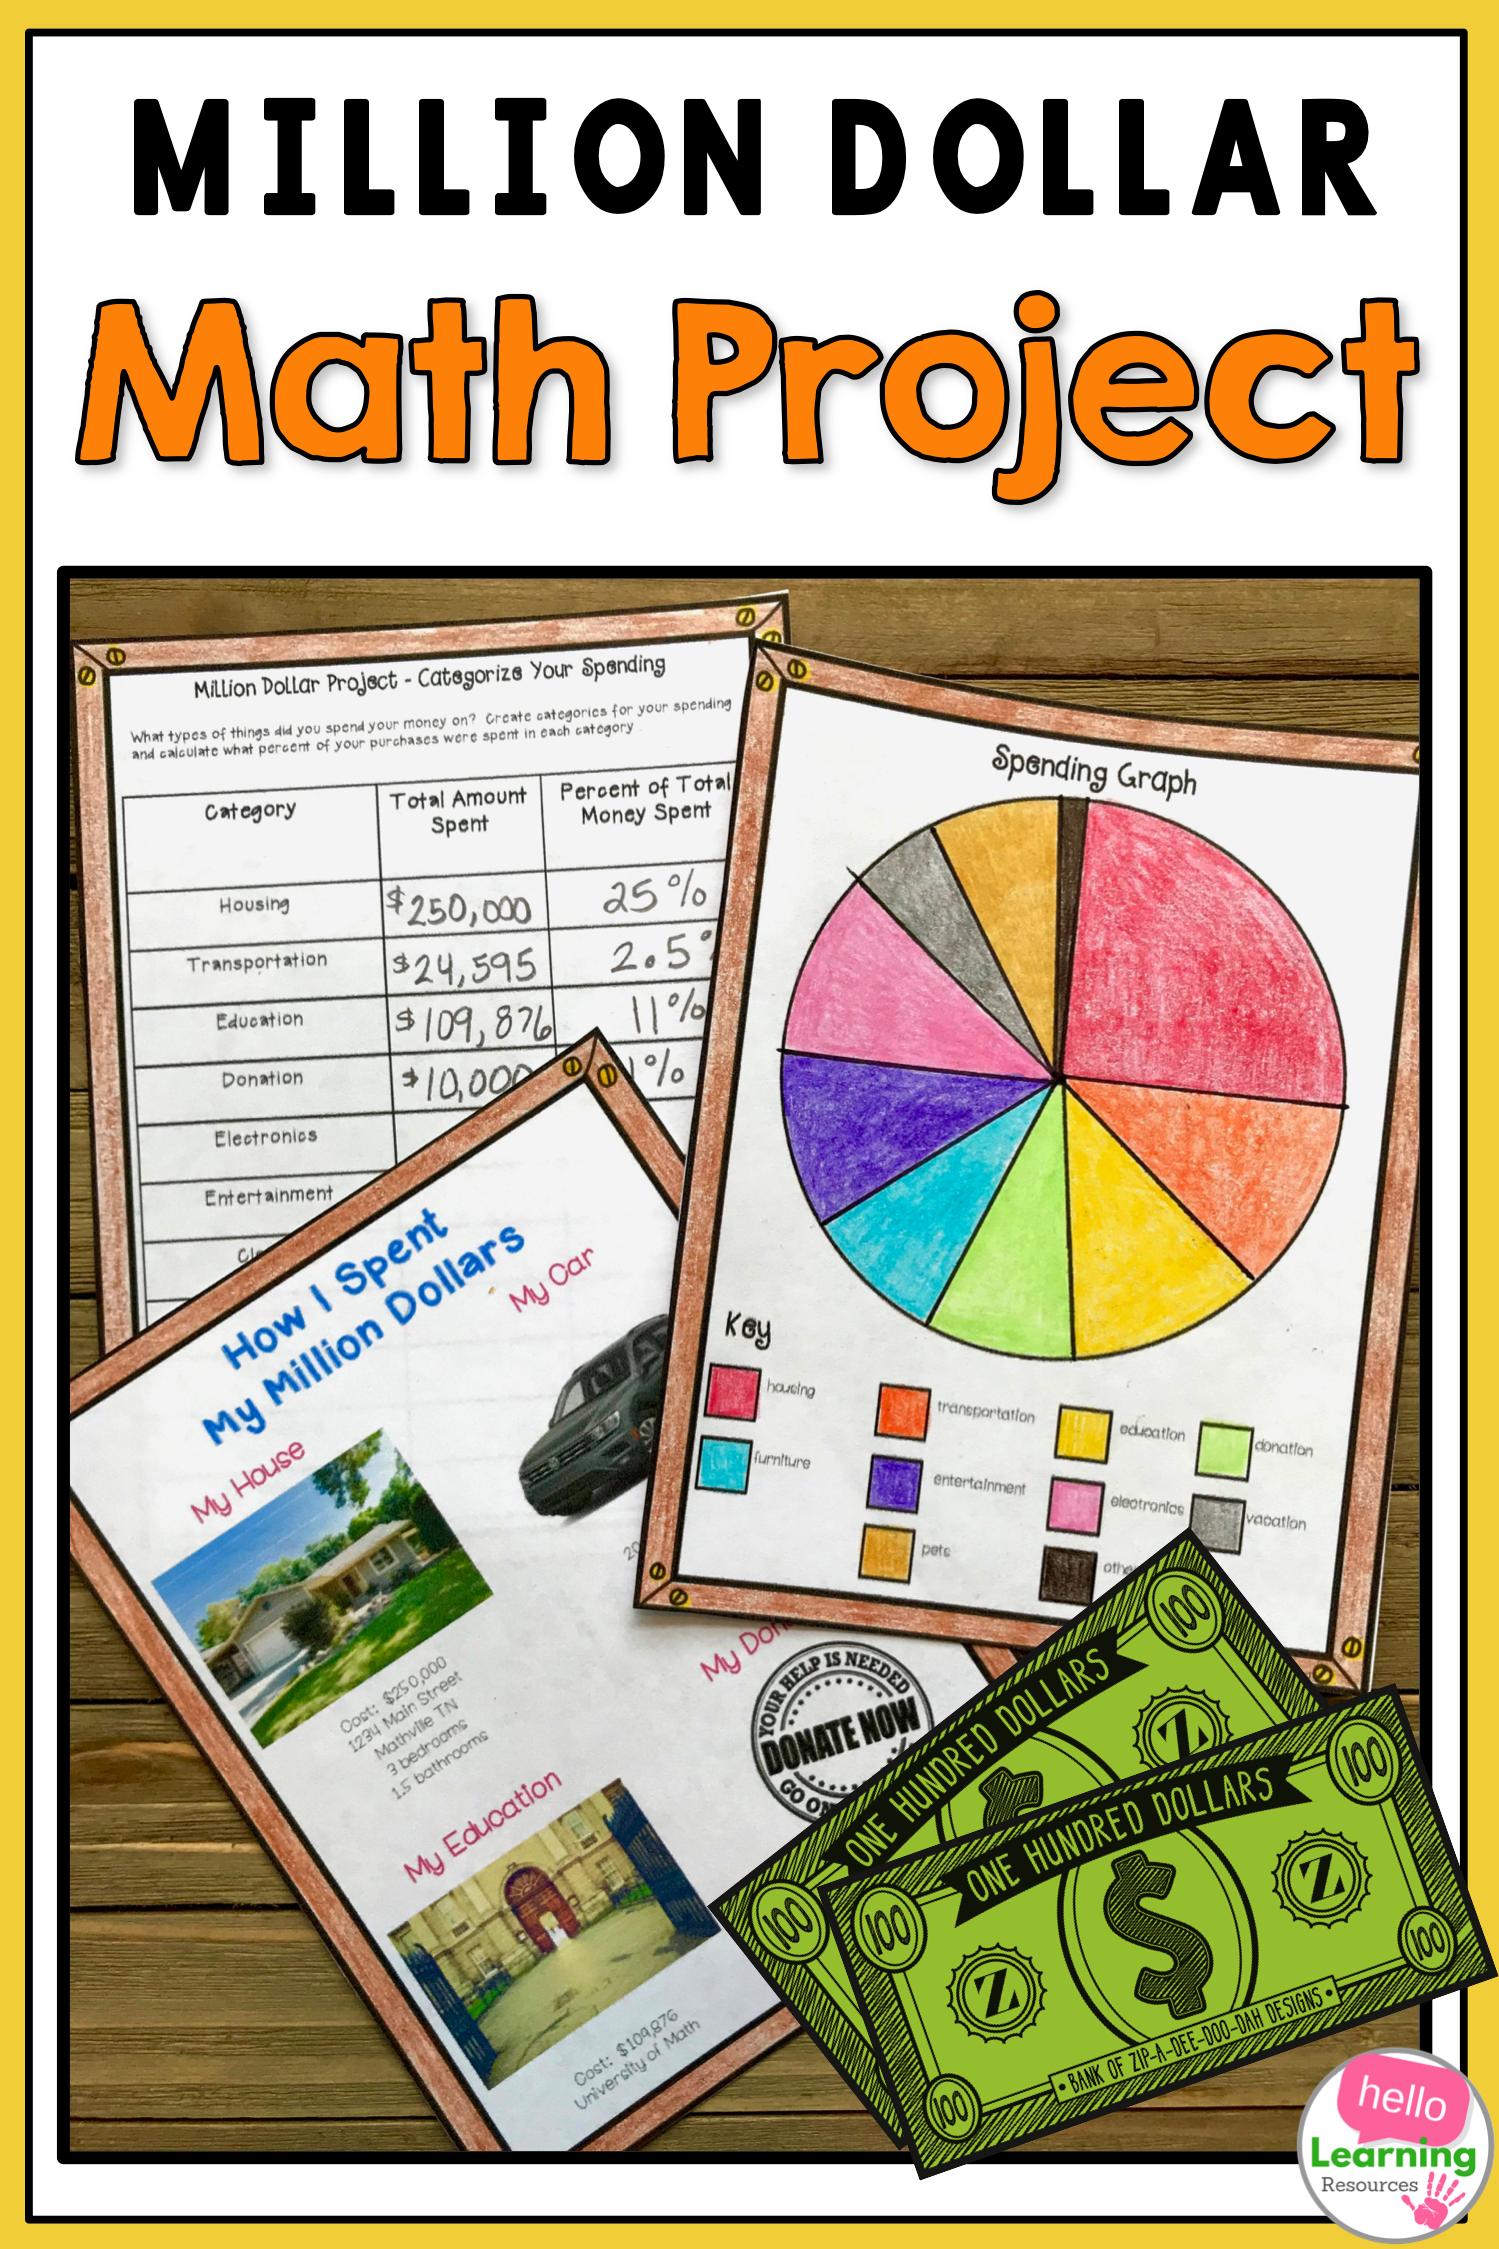 Million Dollar Math Project   Math projects [ 2249 x 1499 Pixel ]